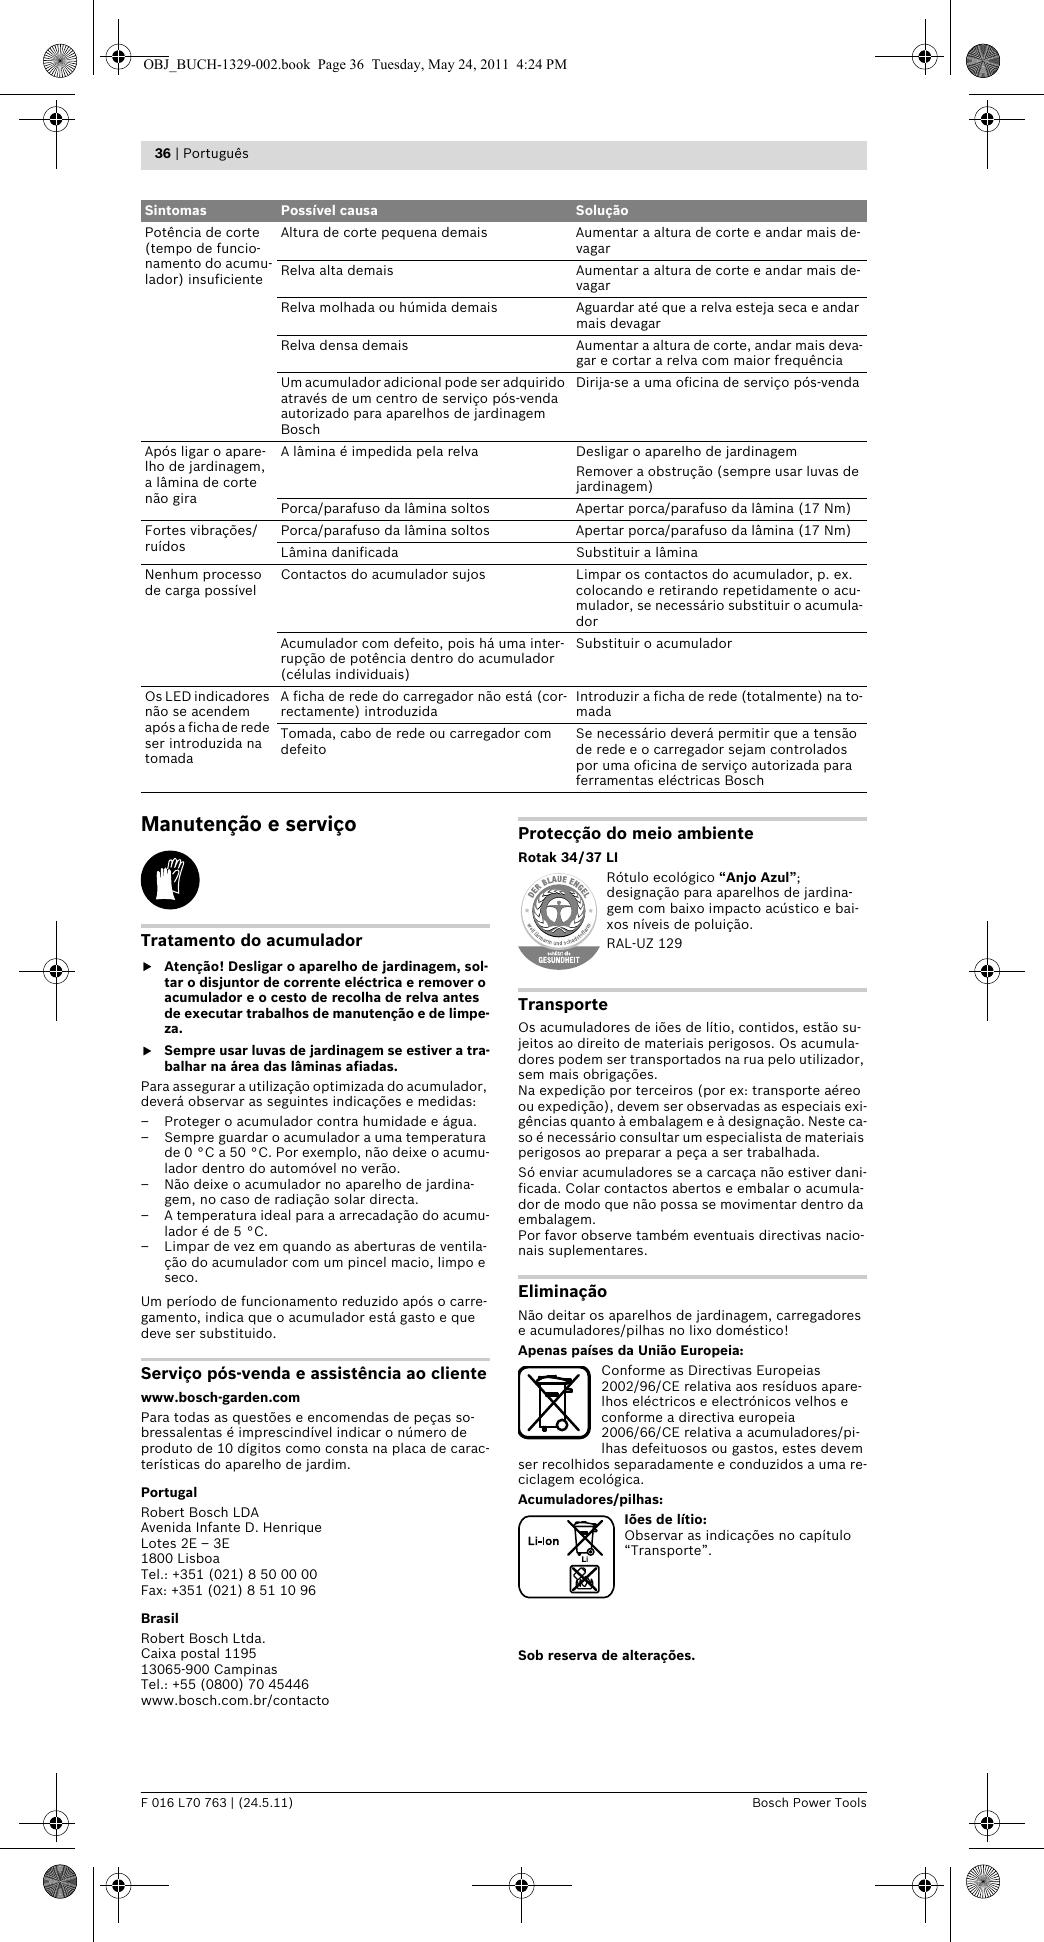 BoschRotak37Li User Guide Page 36